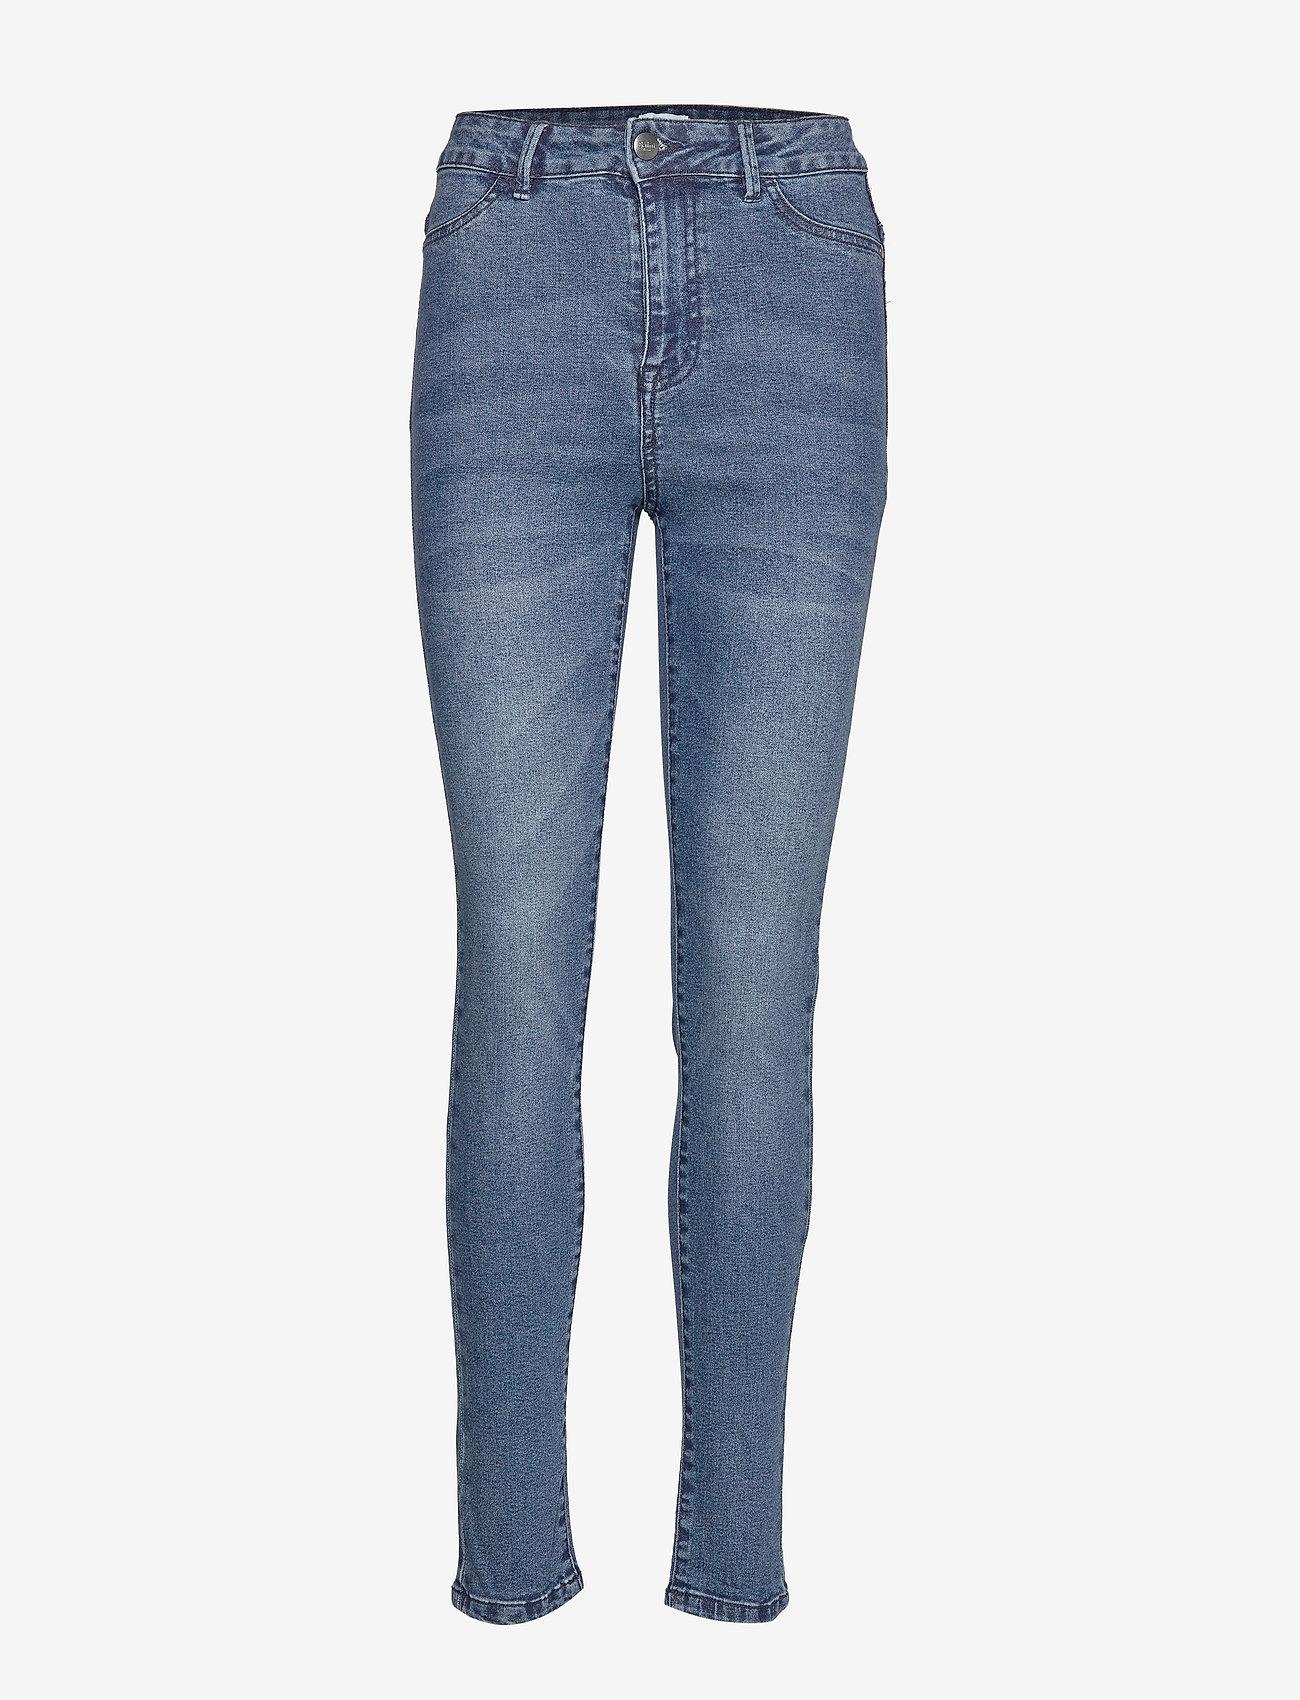 Saint Tropez - T5757, TinnaSZ Jeans - skinny jeans - med.blue - 1